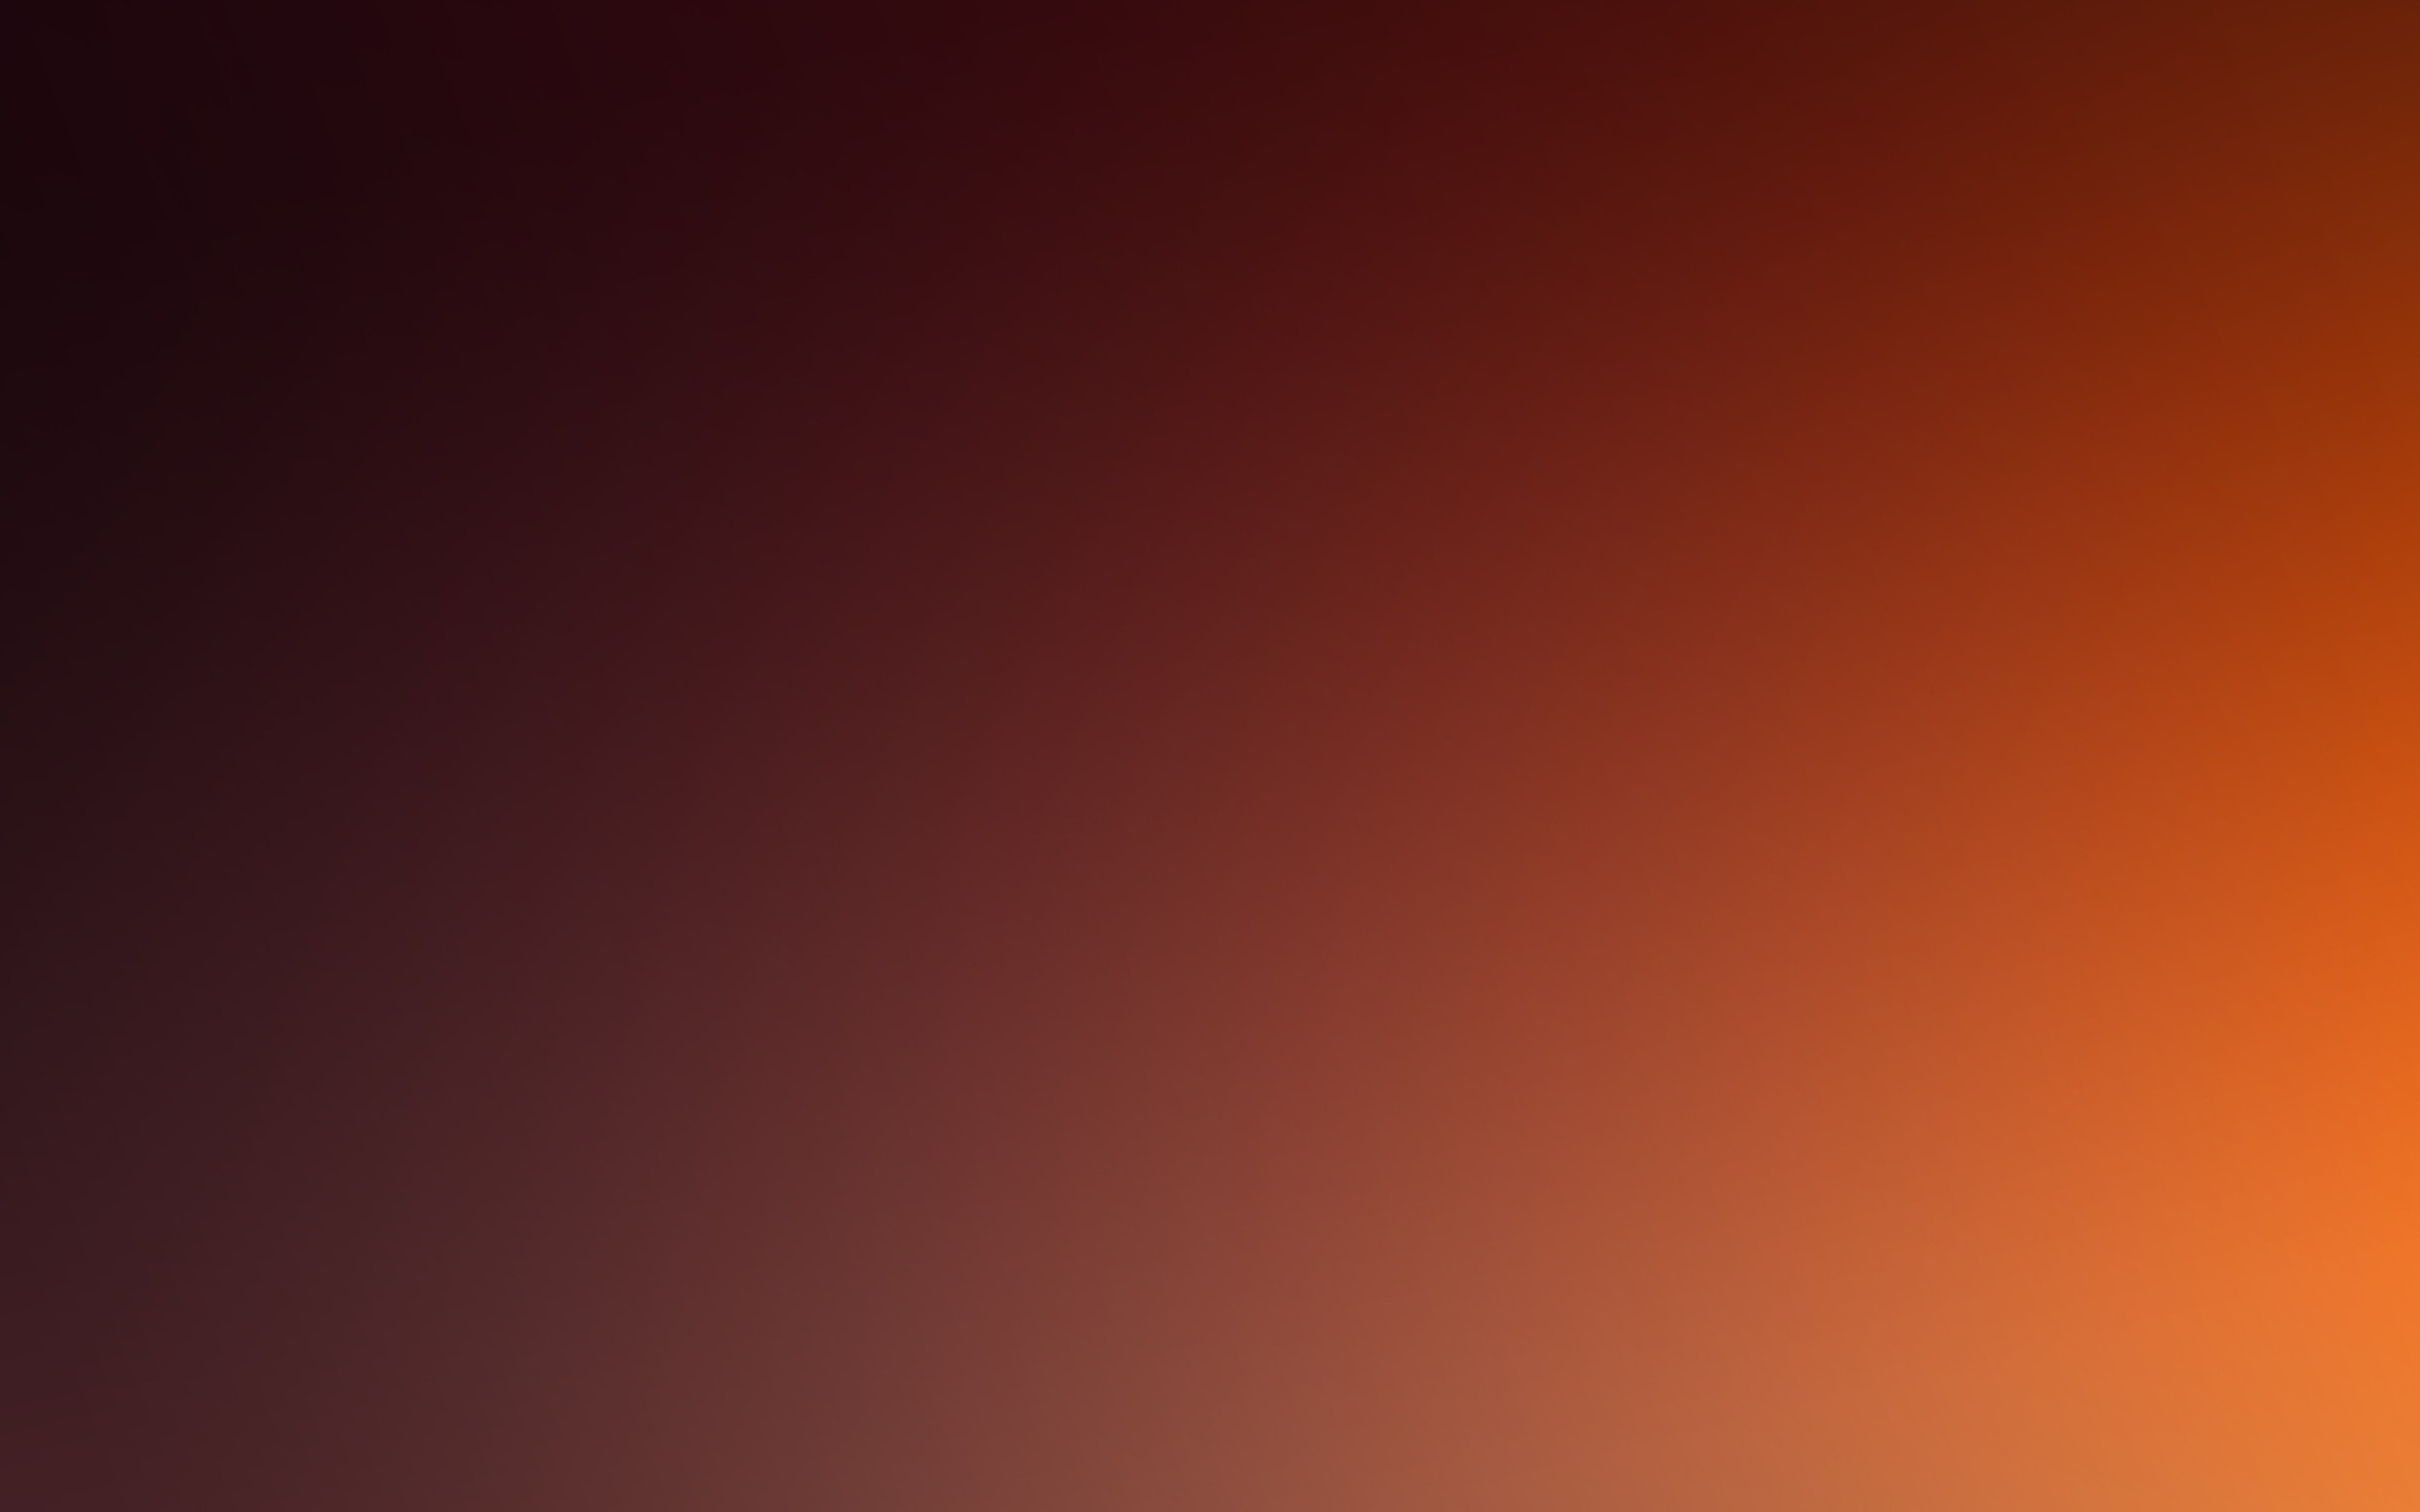 Minimalistic dark multicolor orange textures magenta windows 8 wallpaper